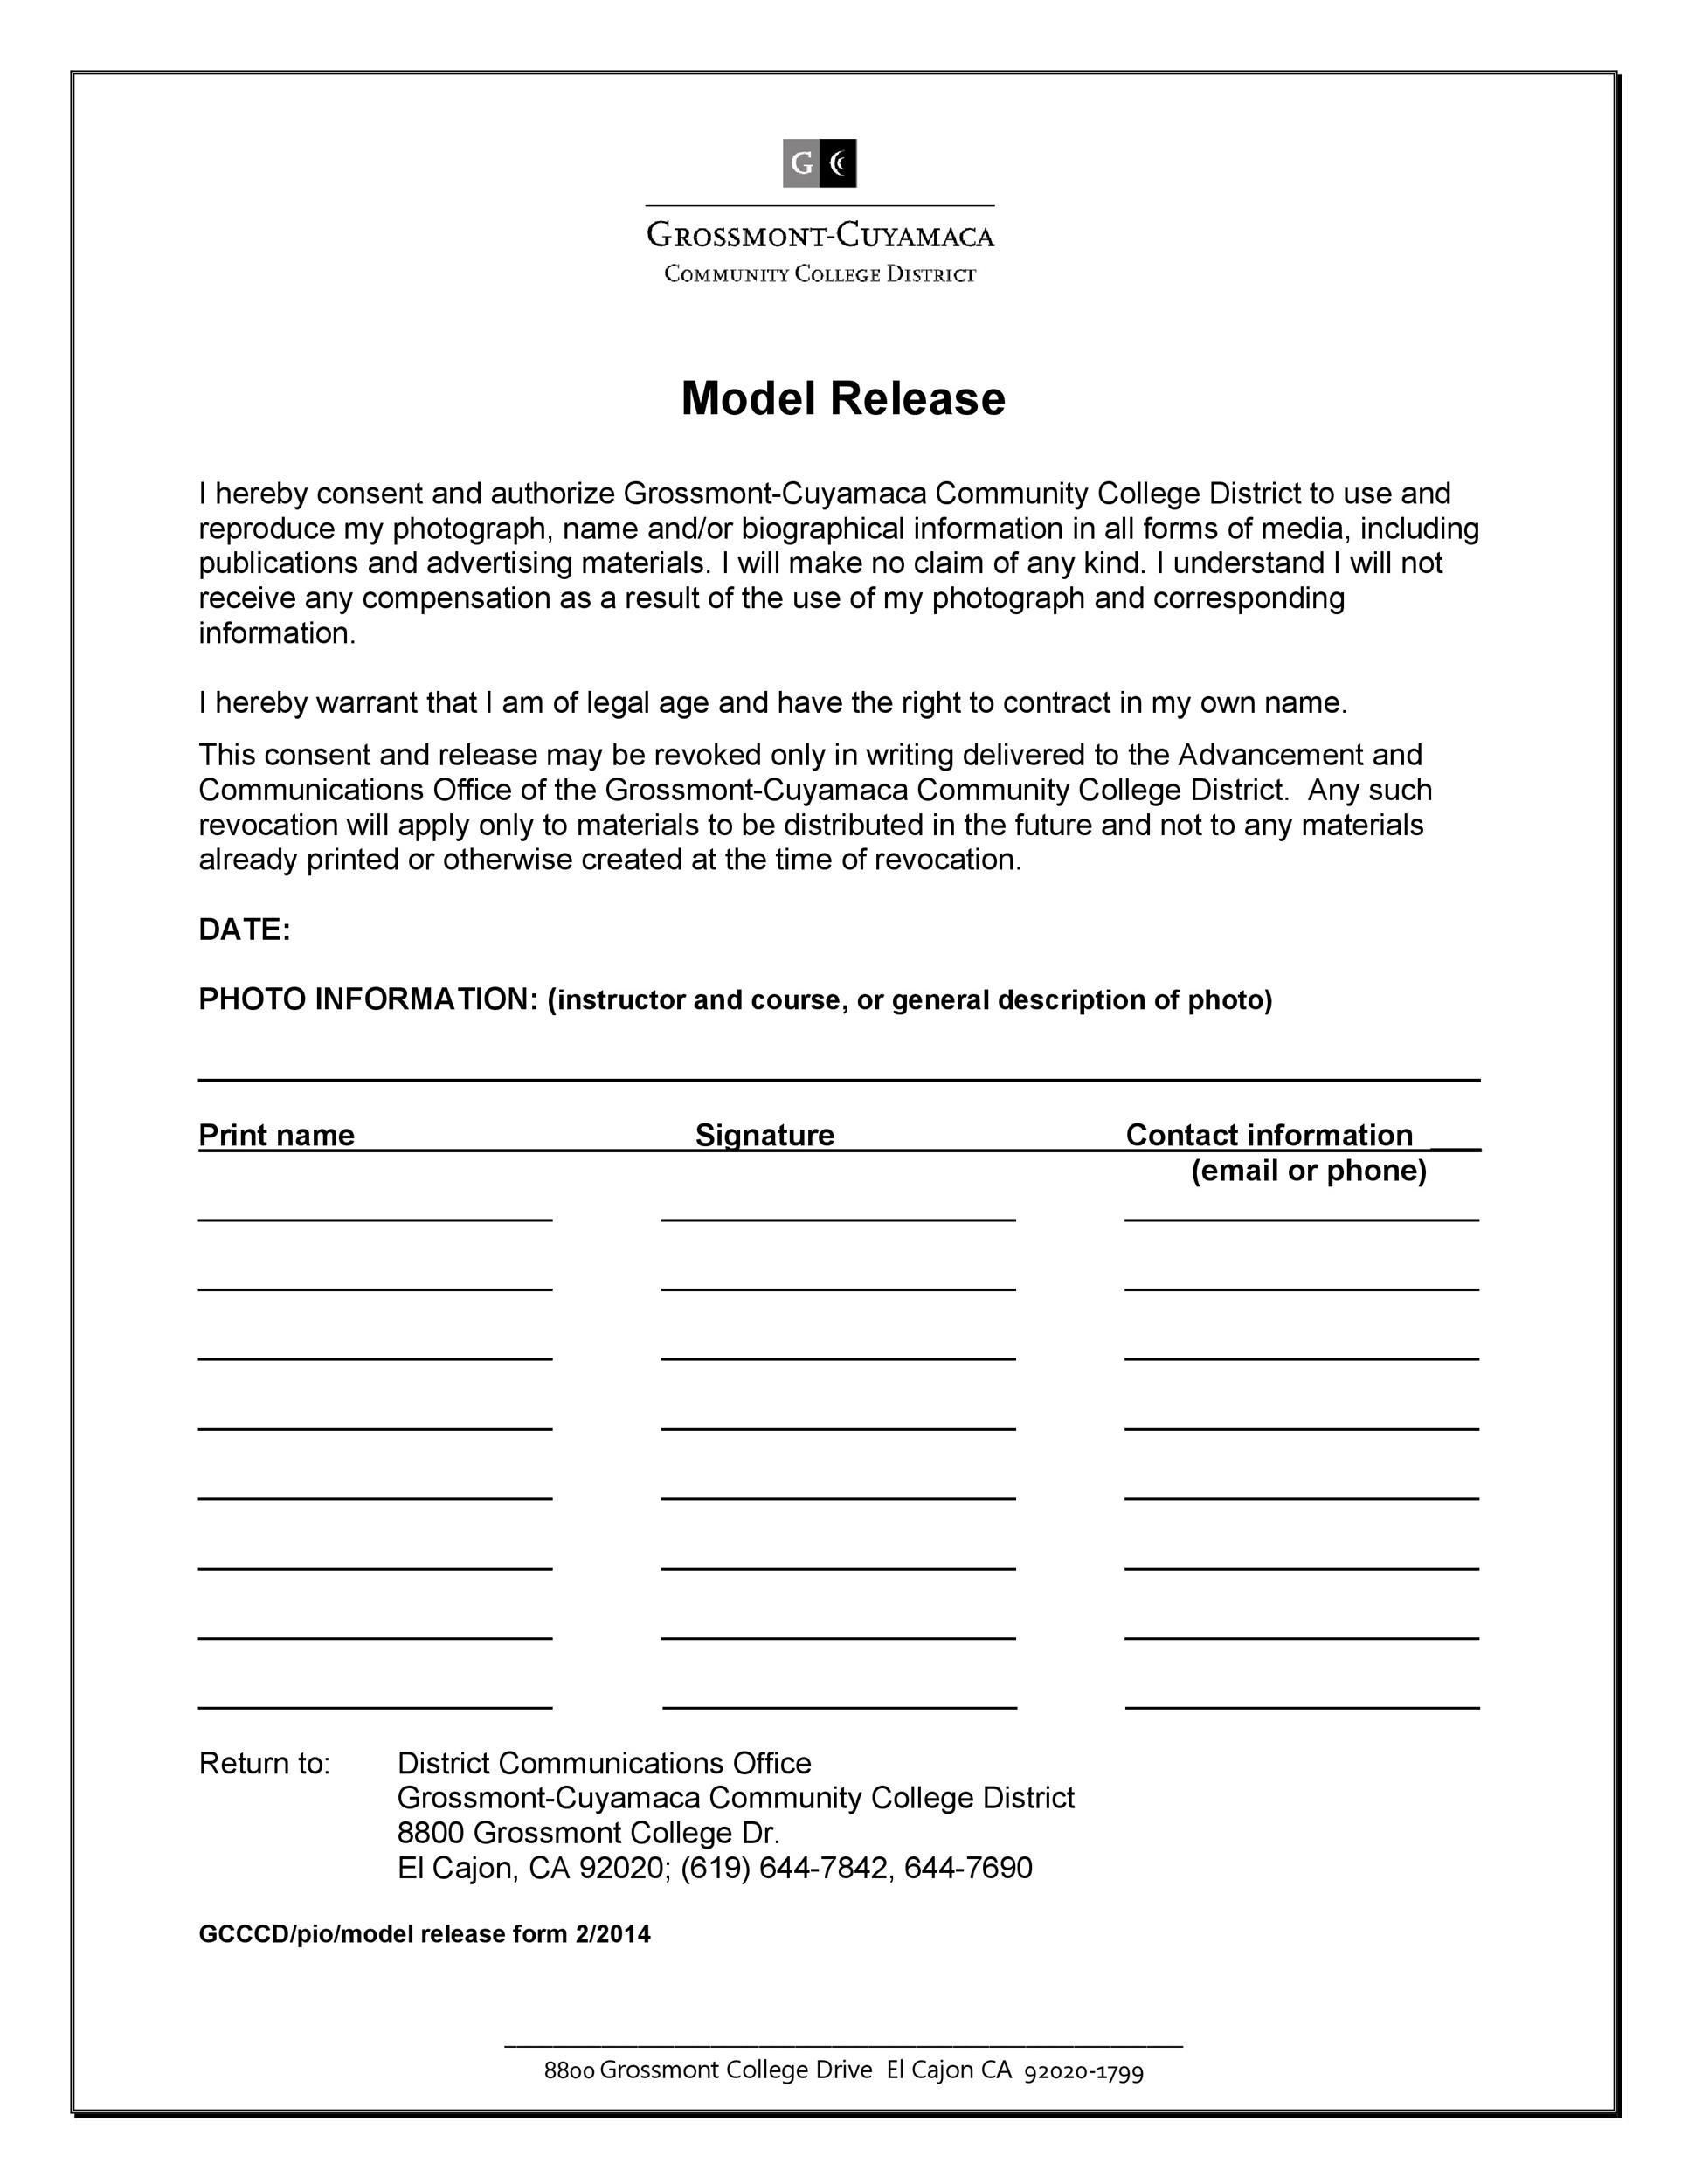 Free model release form 43